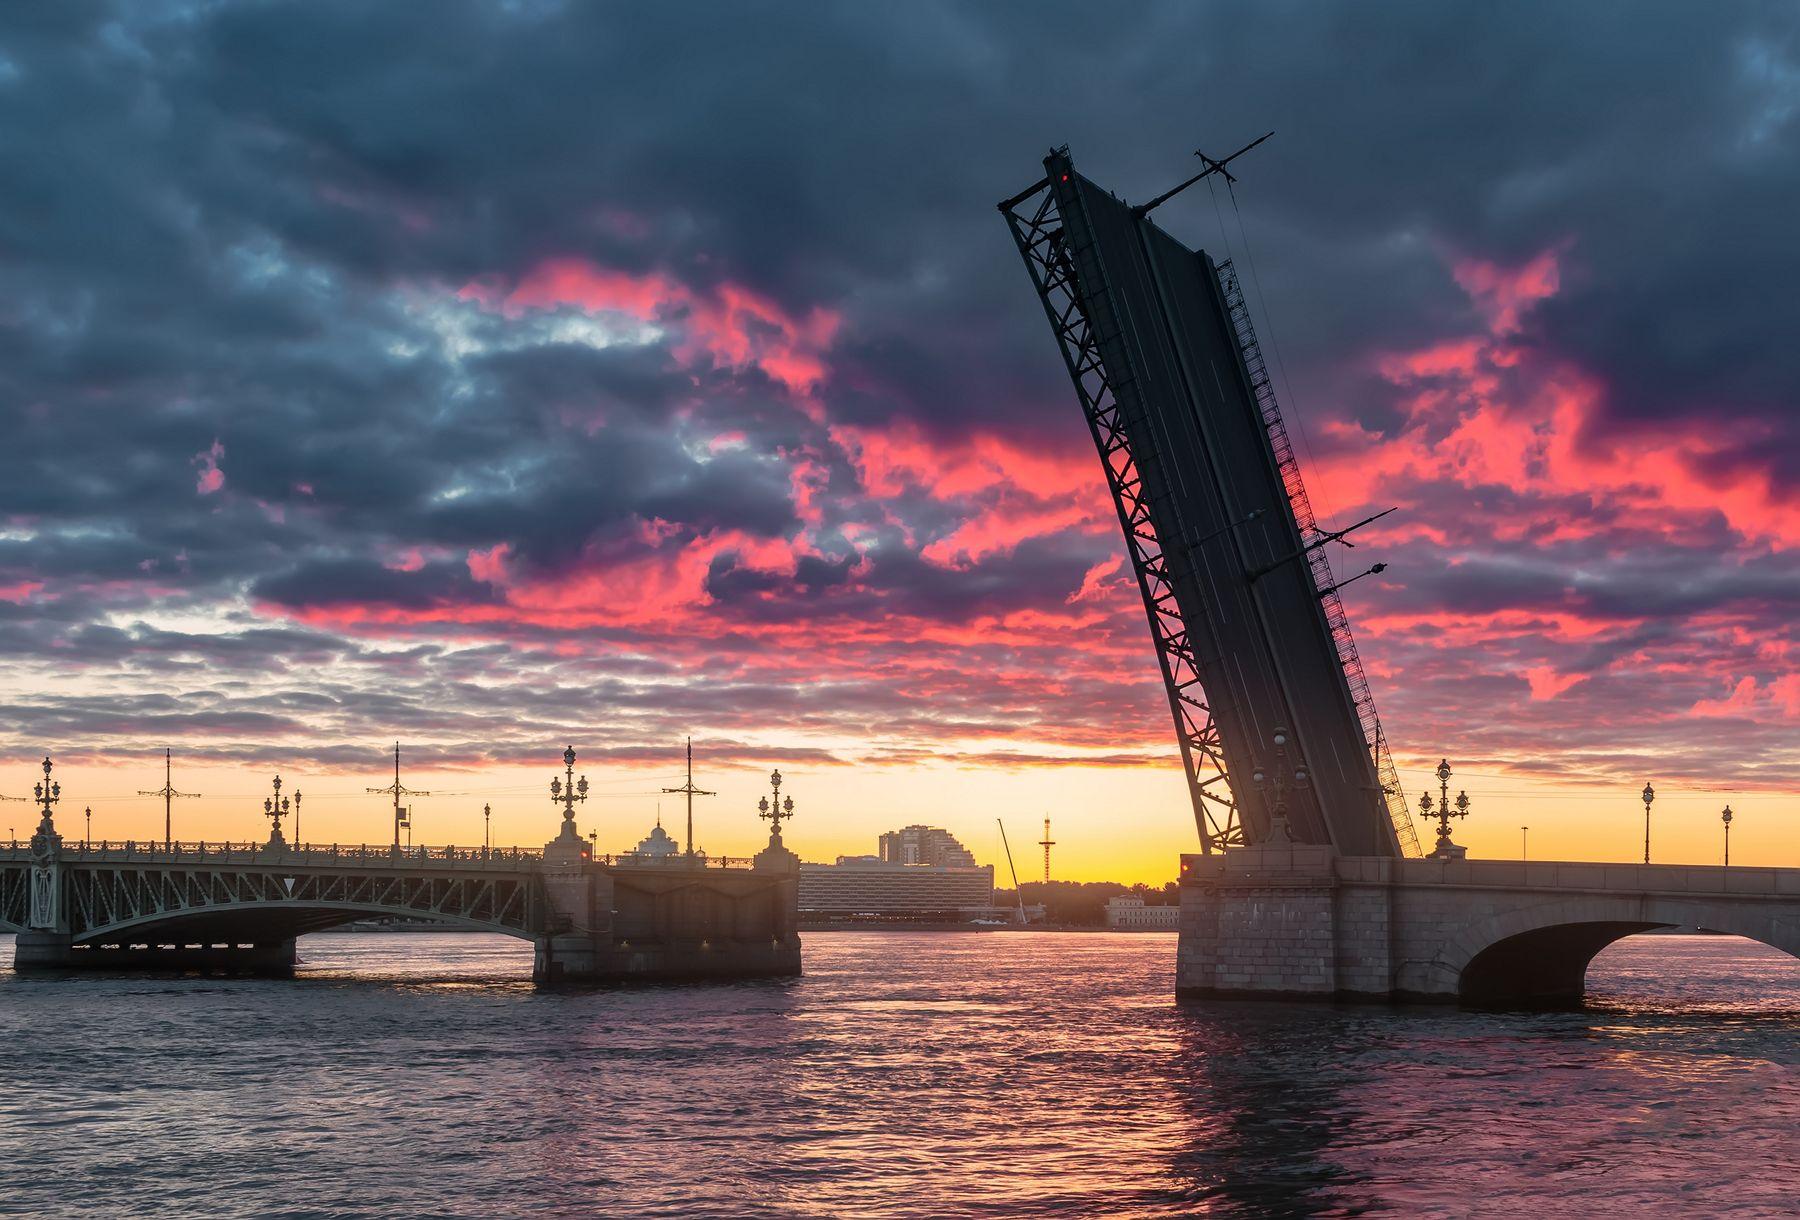 Созерцание нового рассвета Санкт-Петербург утро мост вода облака май небо синева Нева